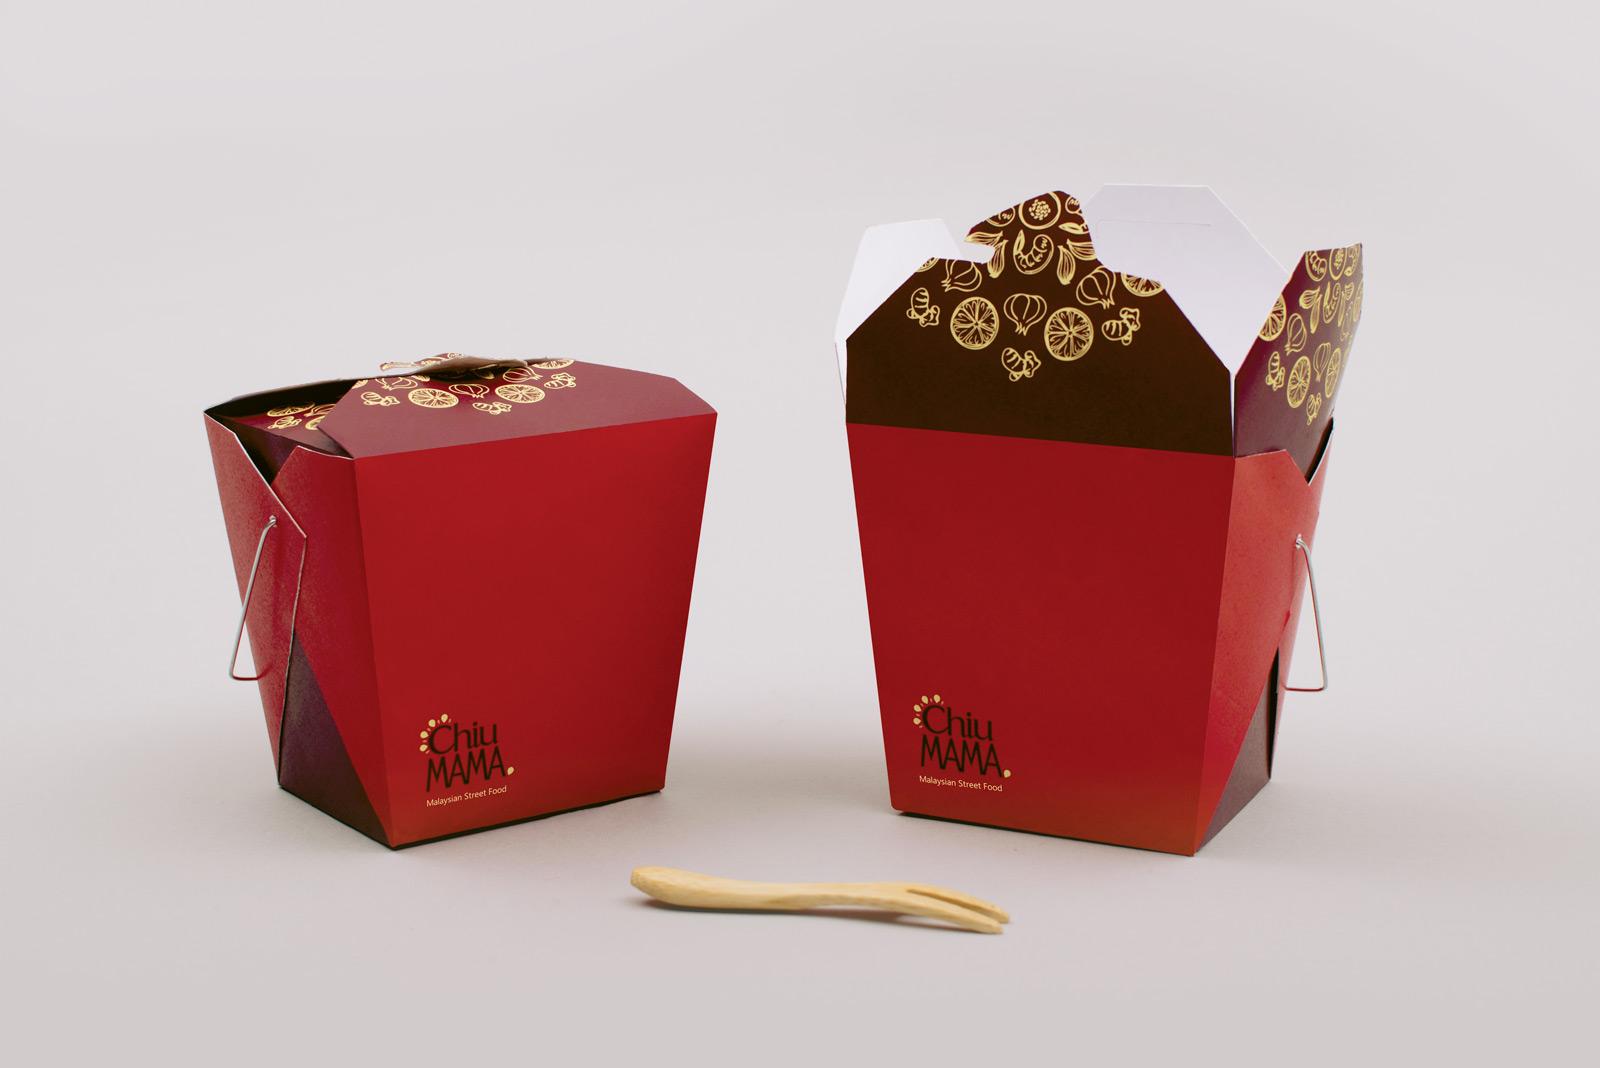 chiu-mama-food-container-geena-mcinnes.jpg